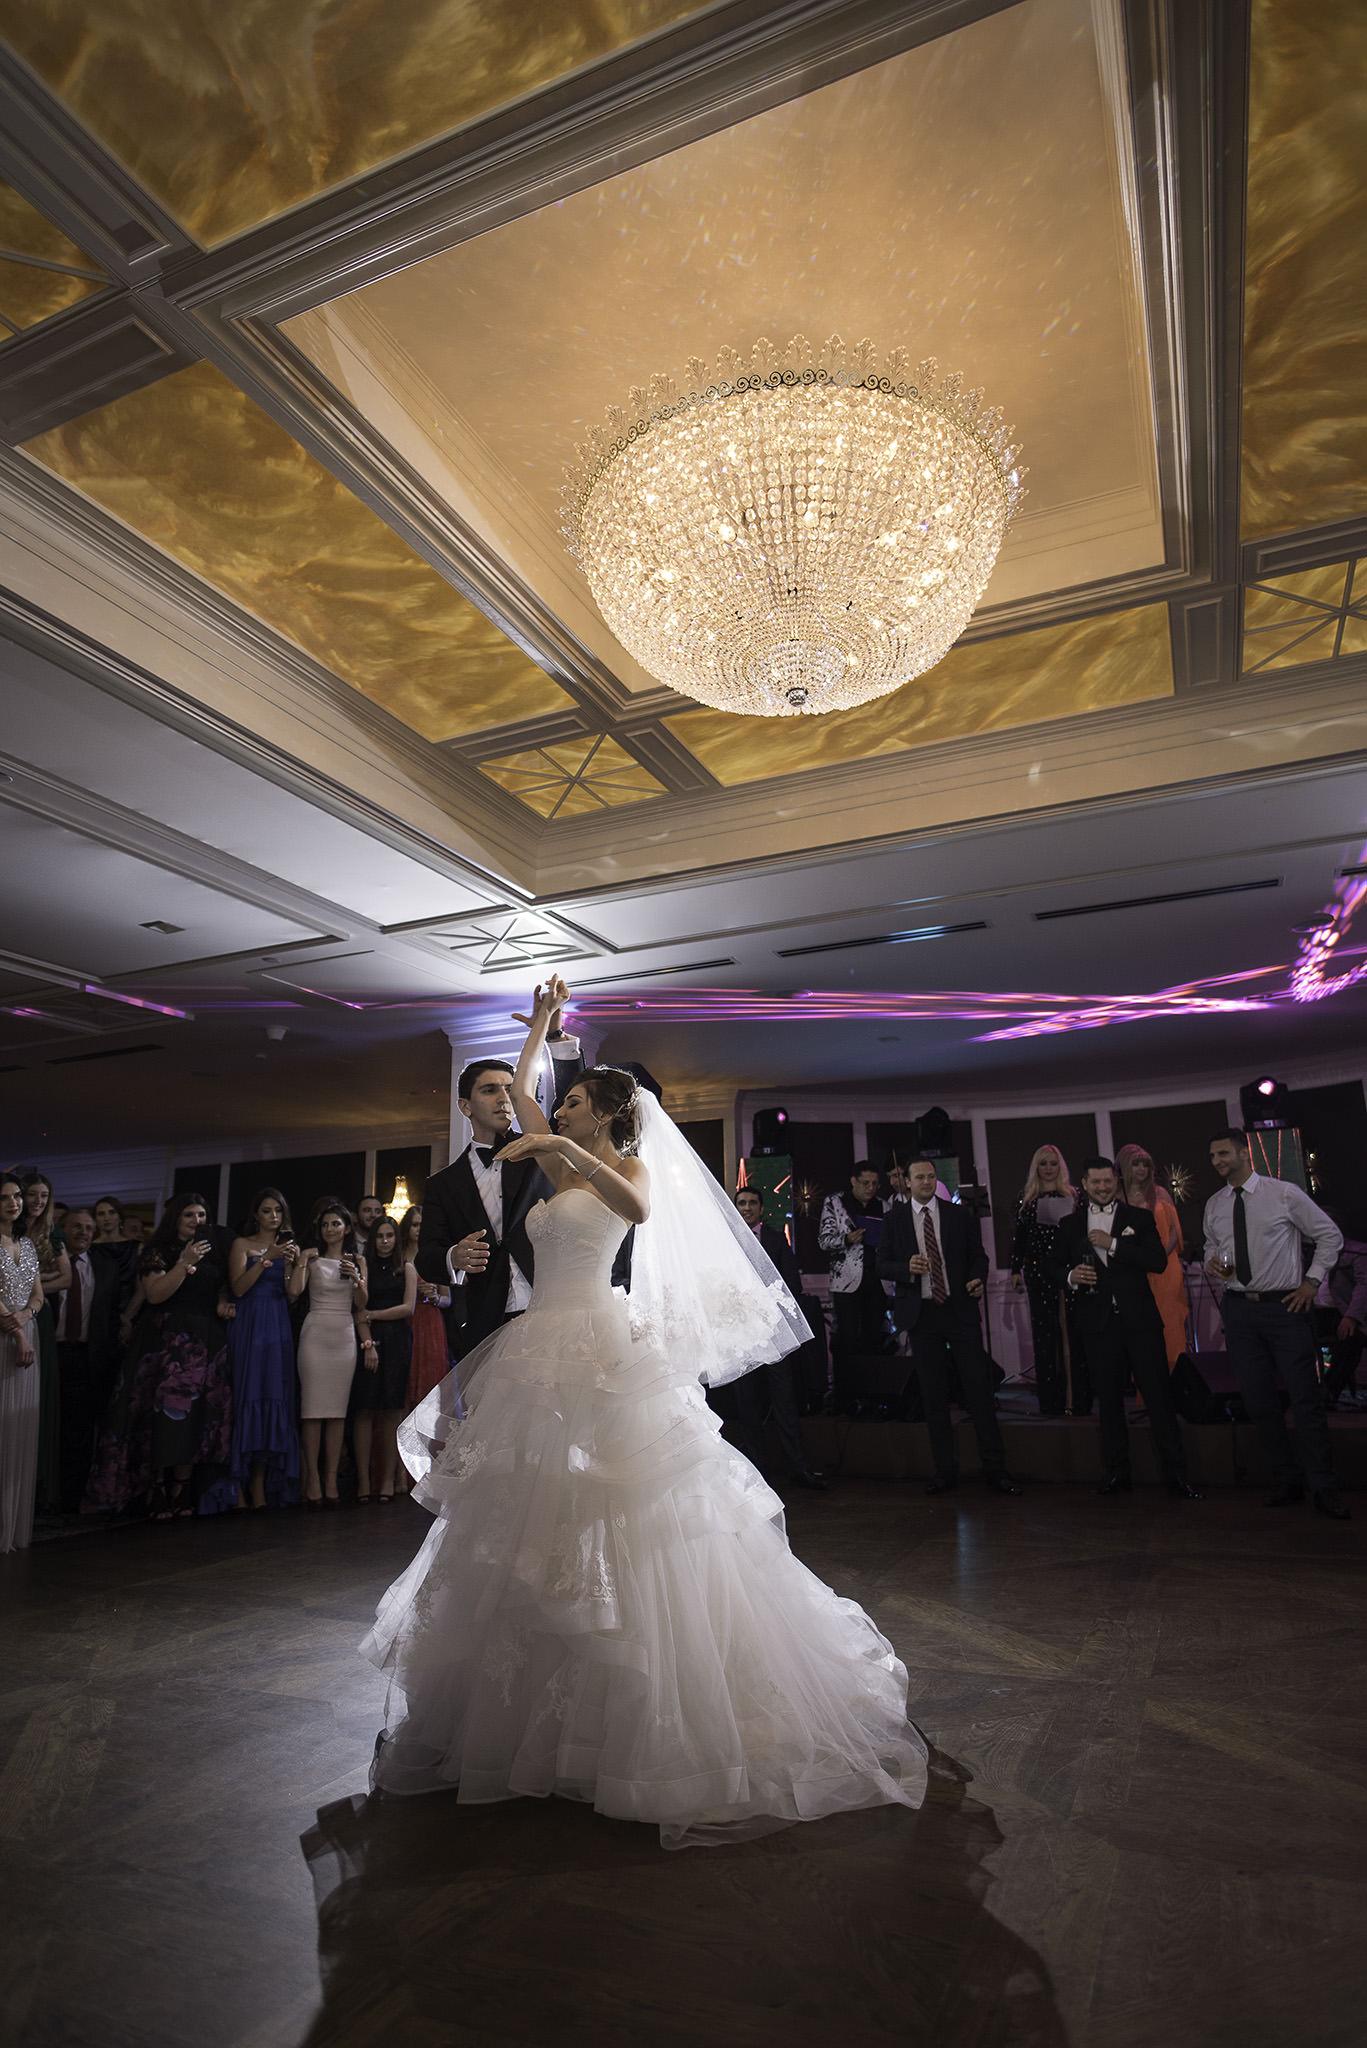 Houston-exotic-classy-luxury-bridal-wedding-azerbaijan-photographer-petroleum-club